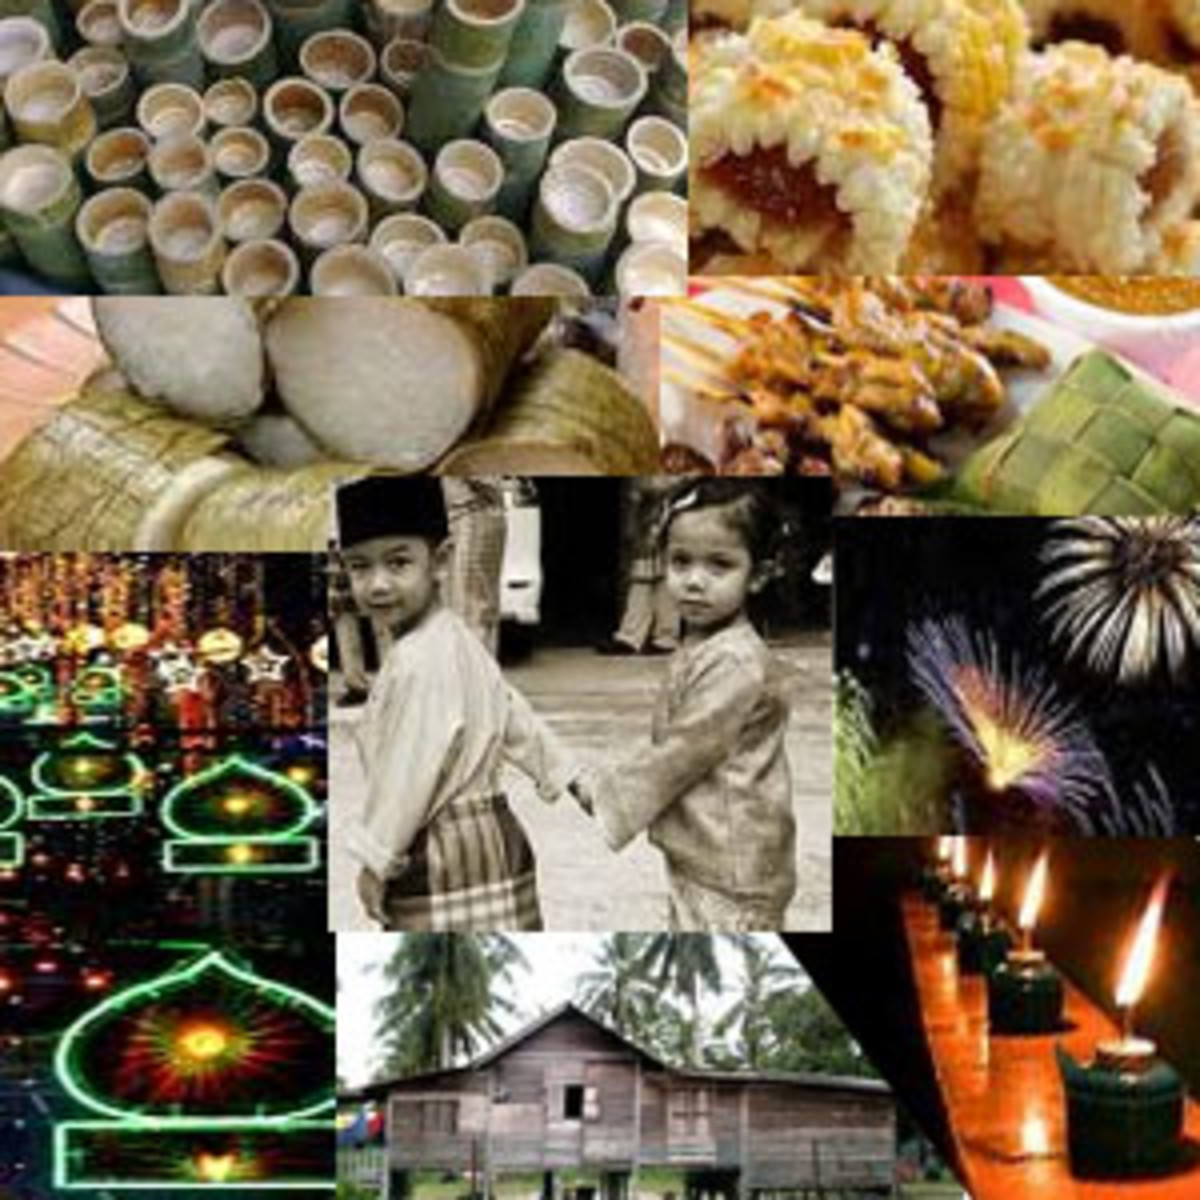 How Muslims in Malaysia celebrate Hari Raya Aidilfitri/Eid Al Fitr